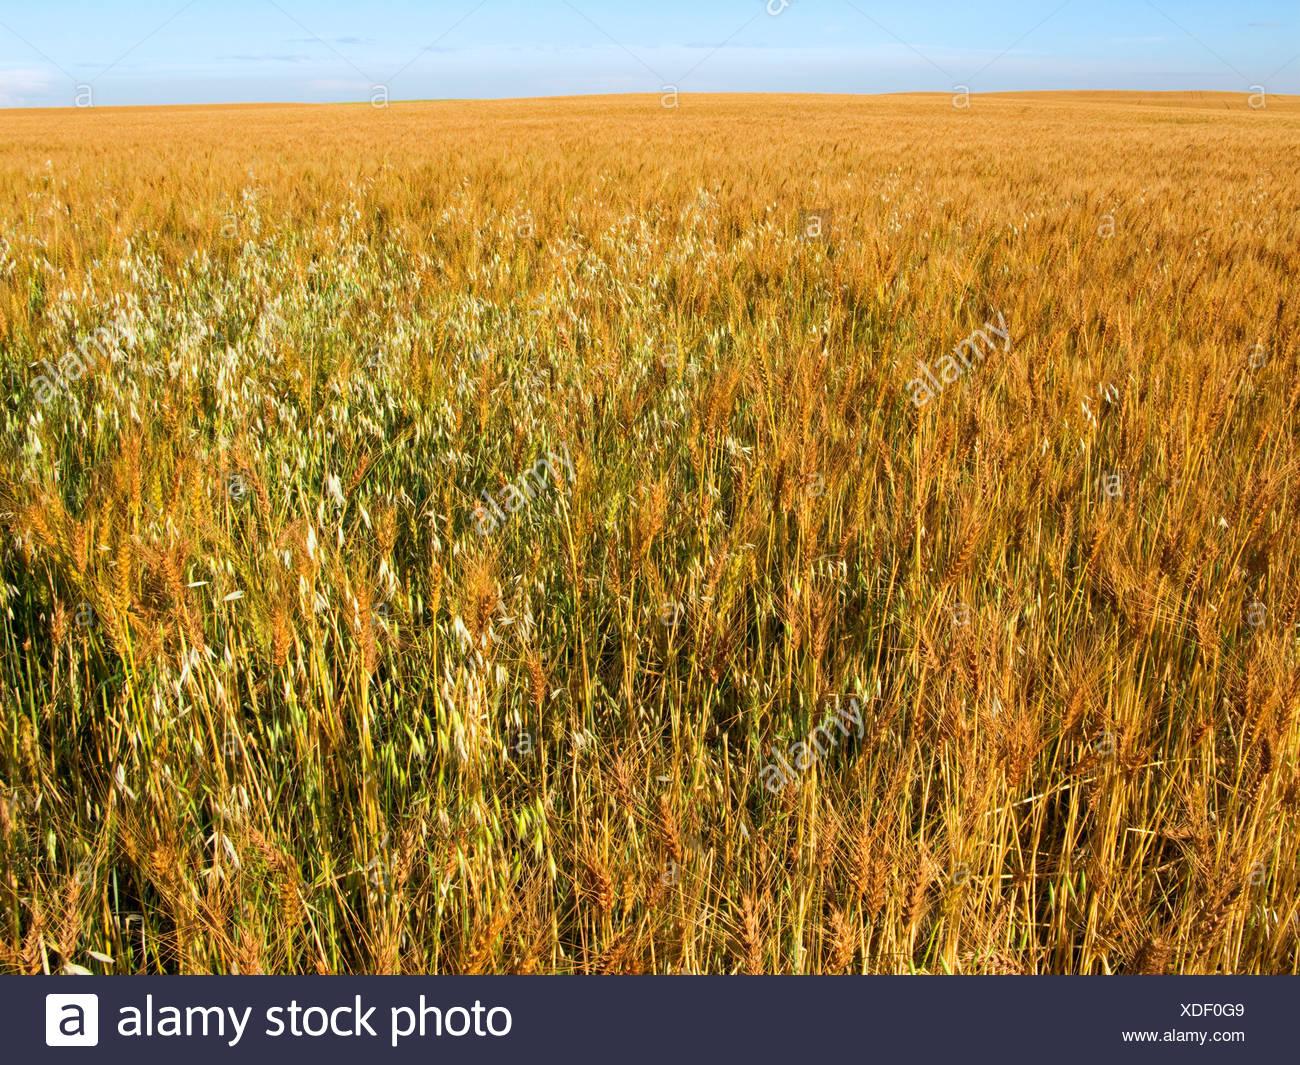 Livestock - Wild oat (Avena fatua) patch infests a ripening grain field / Alberta, Canada. Stock Photo